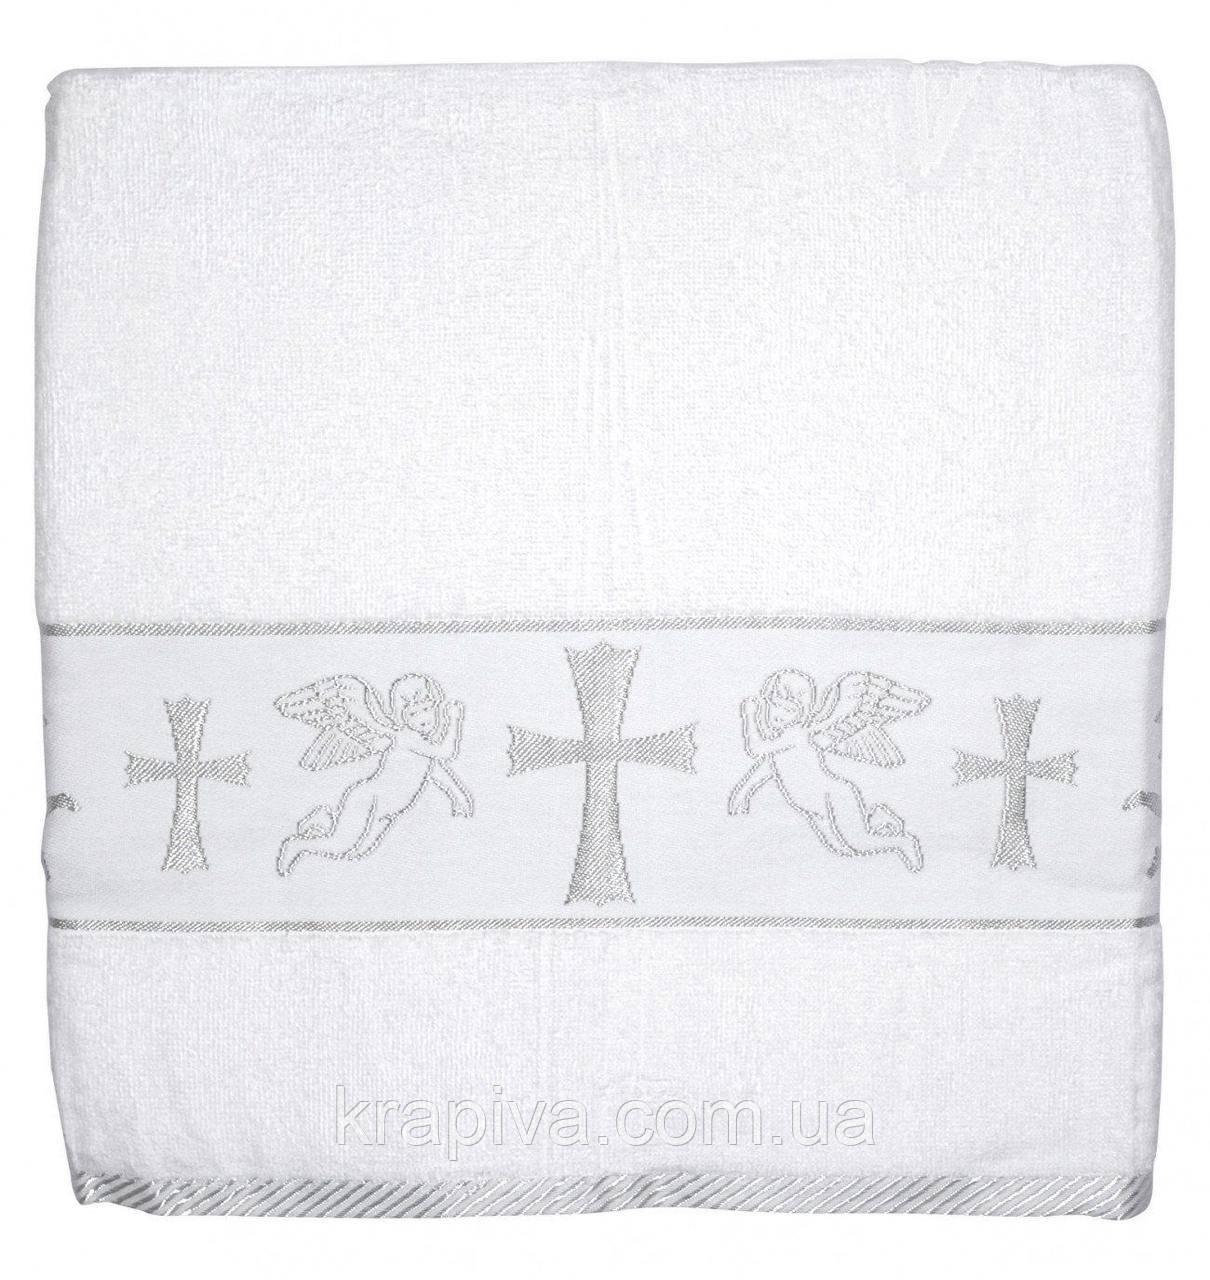 Полотенце крестильное Крыжма Золото детское, Крижма для хрестин дитяча біла з вишивкою, полотенце